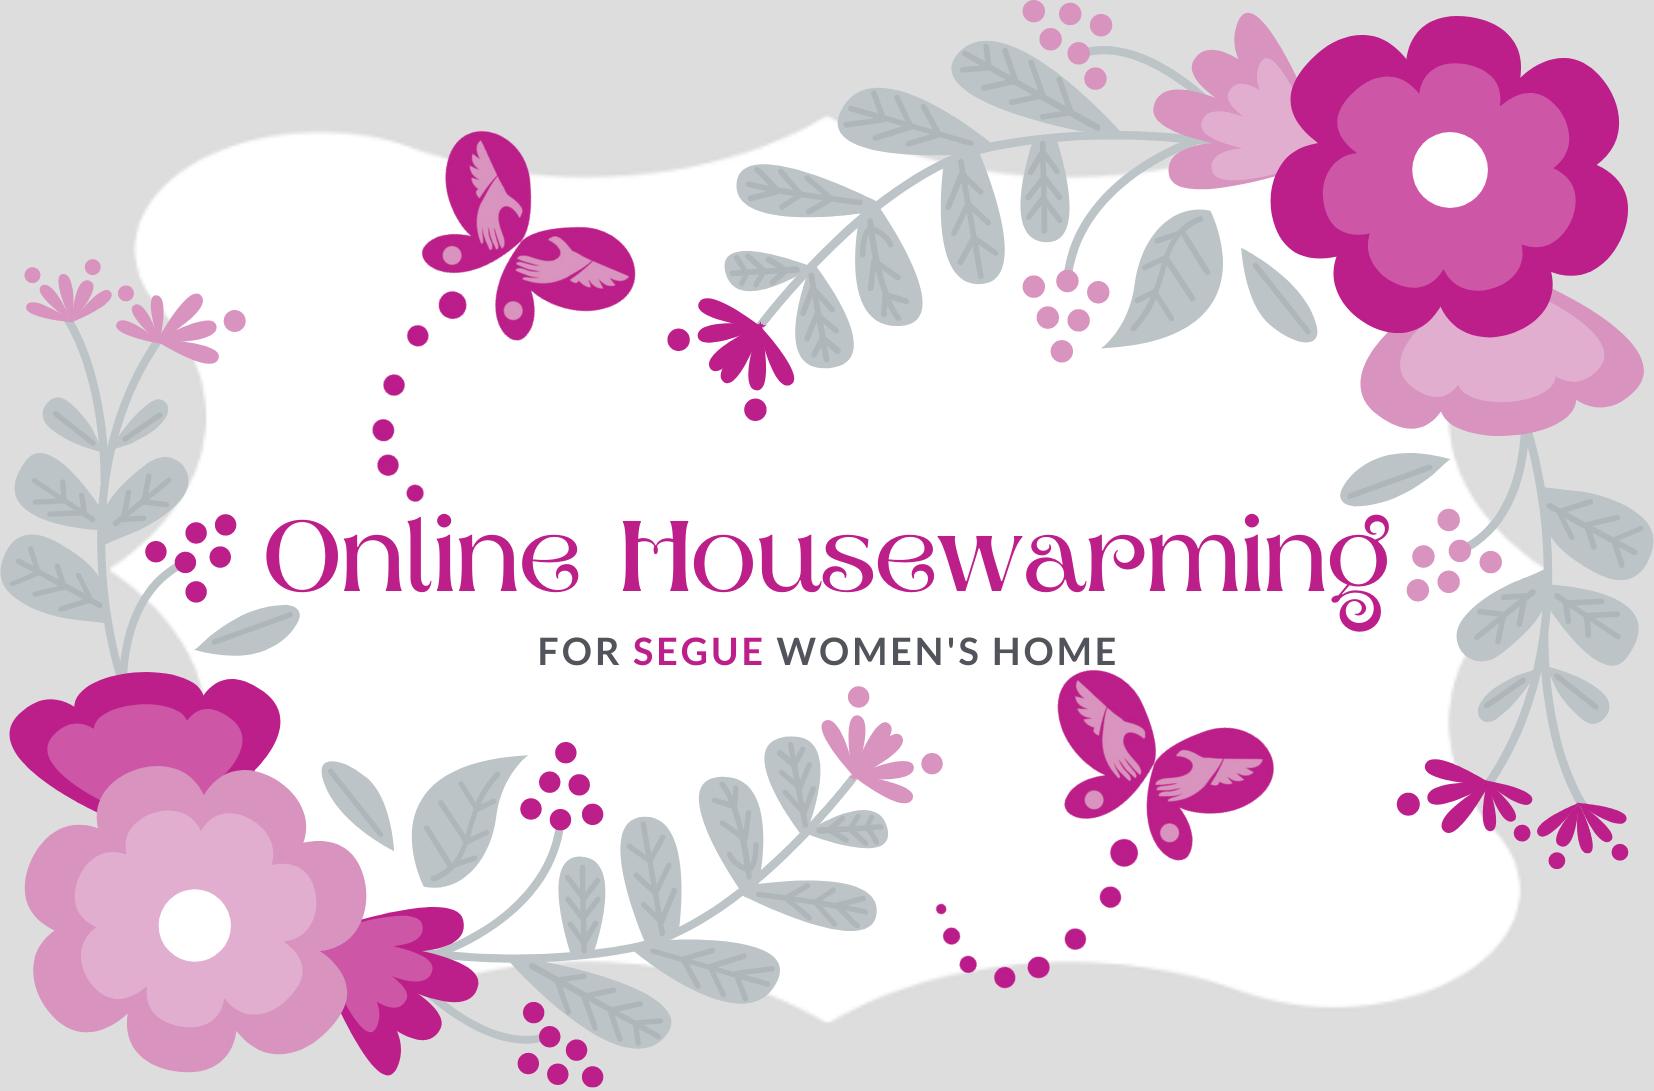 Online Housewarming for Segue Women's Home